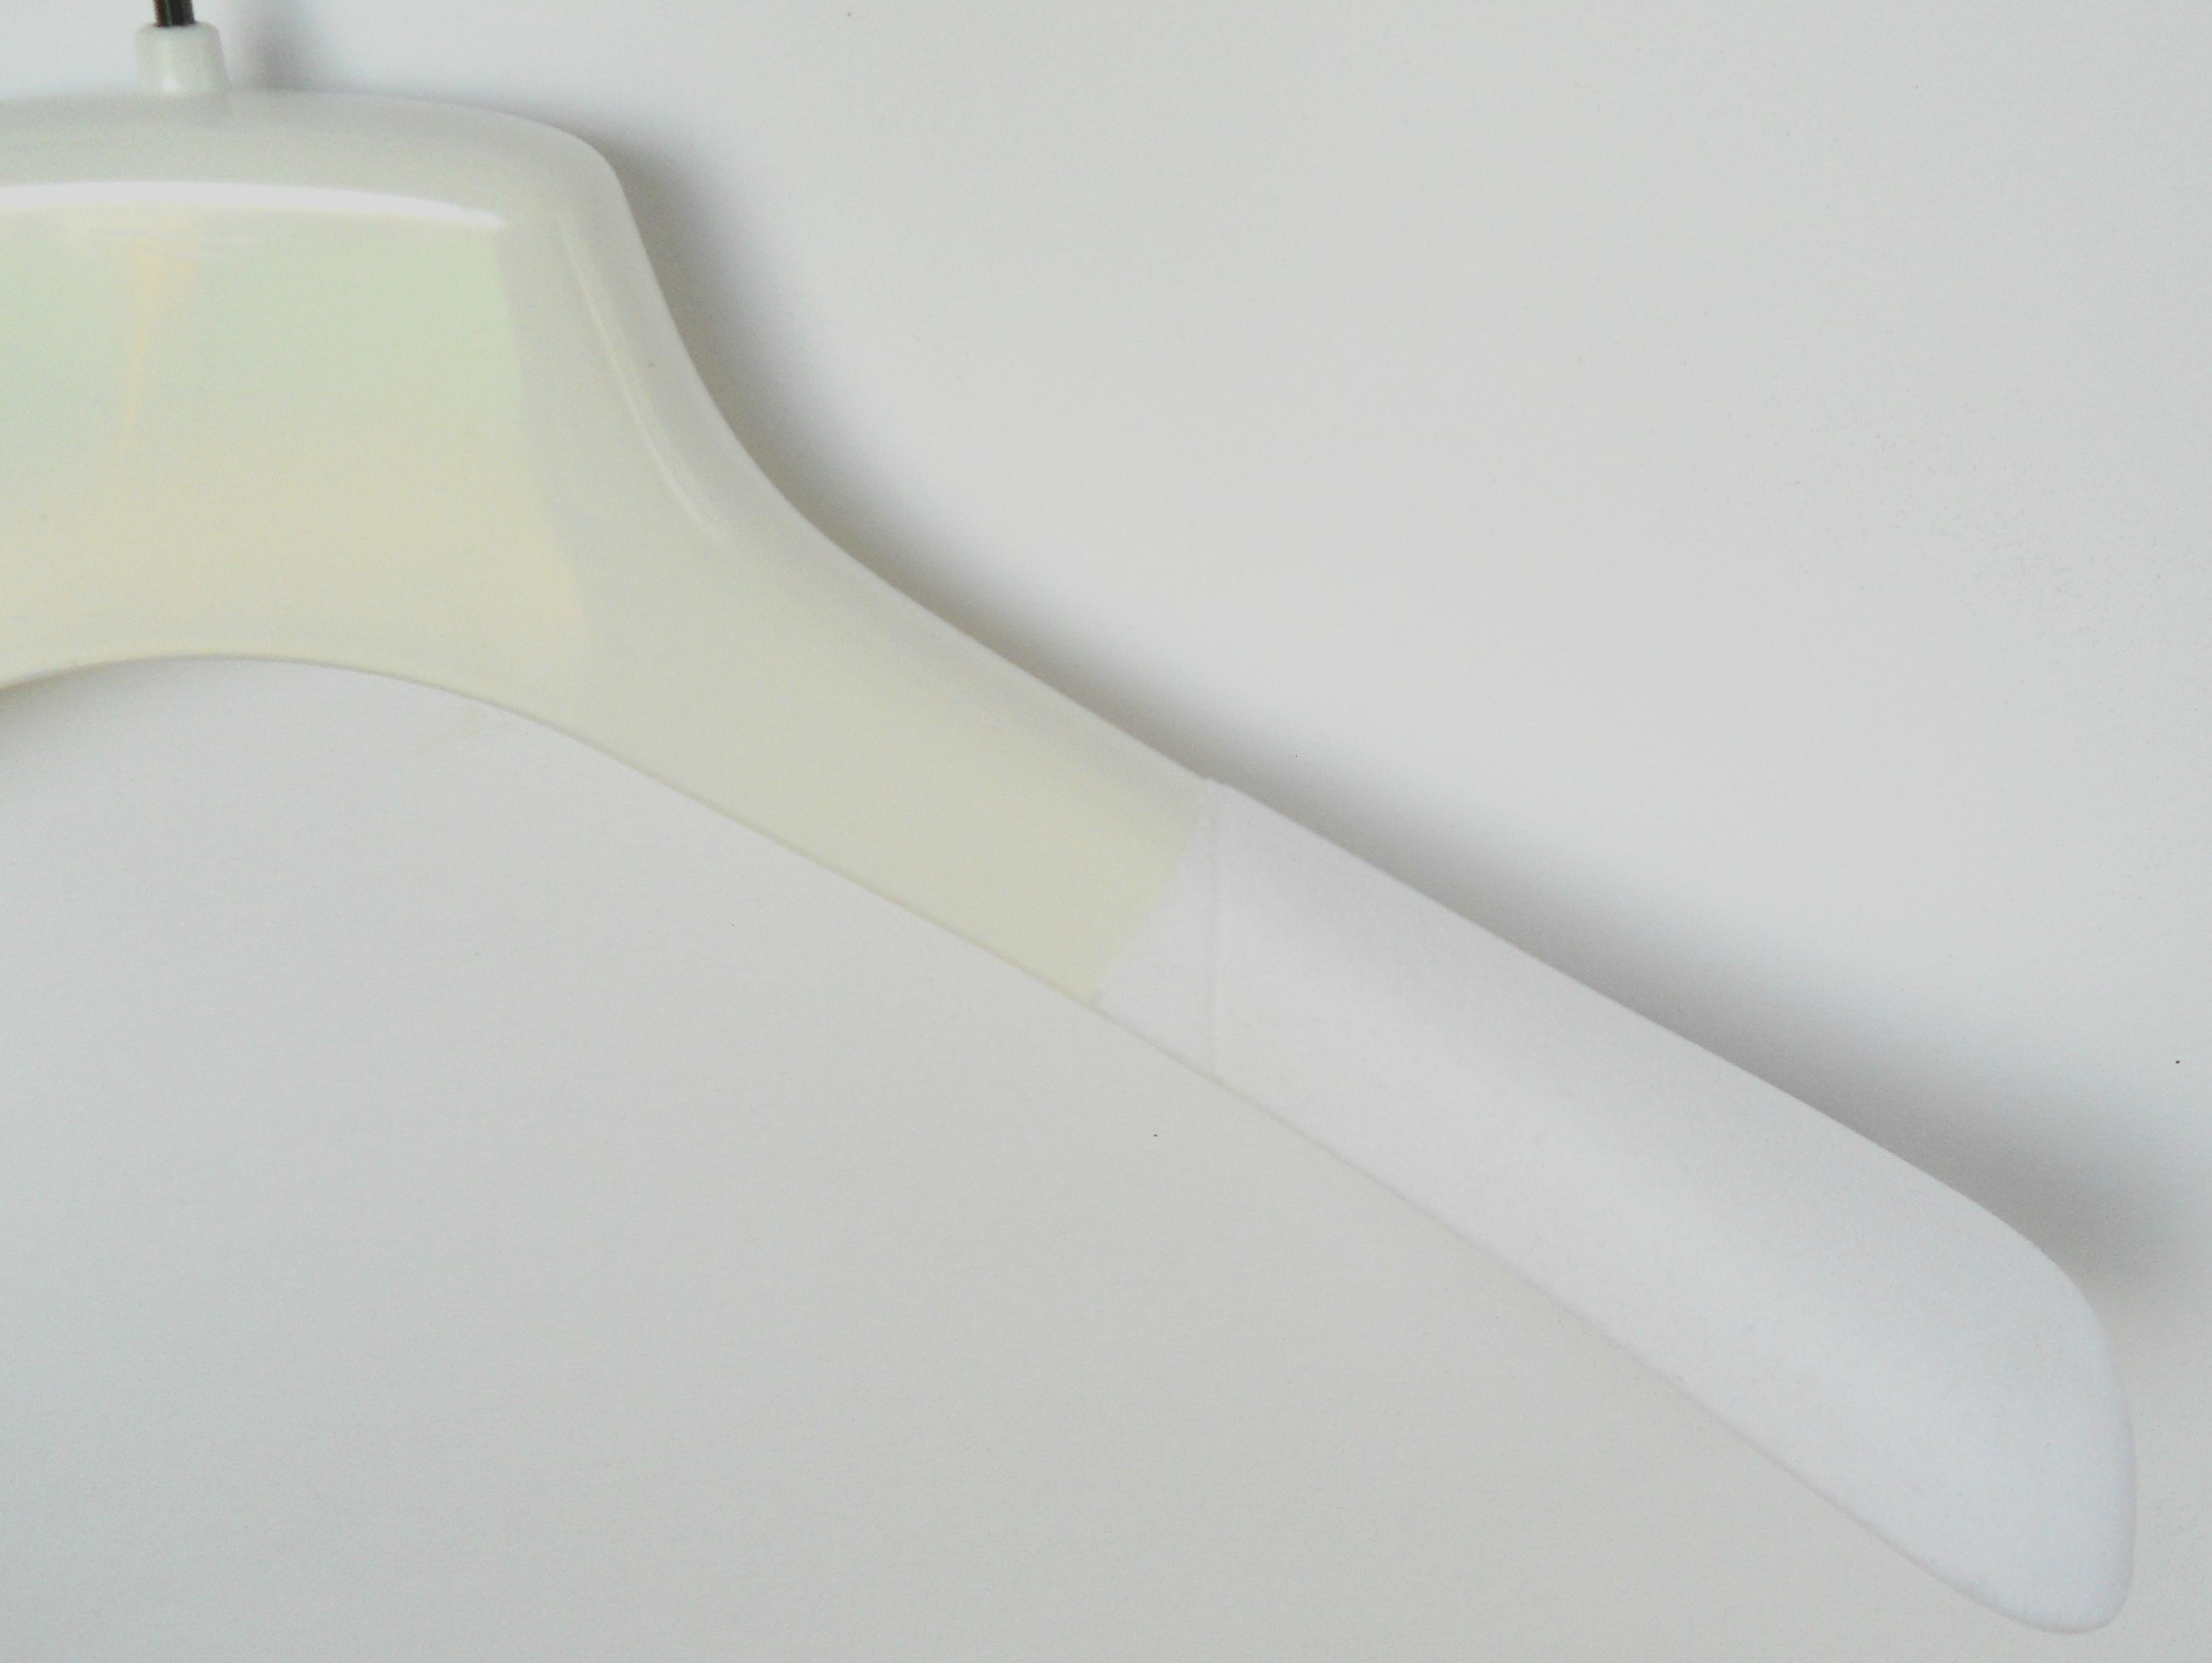 DSCN6130 ridimens